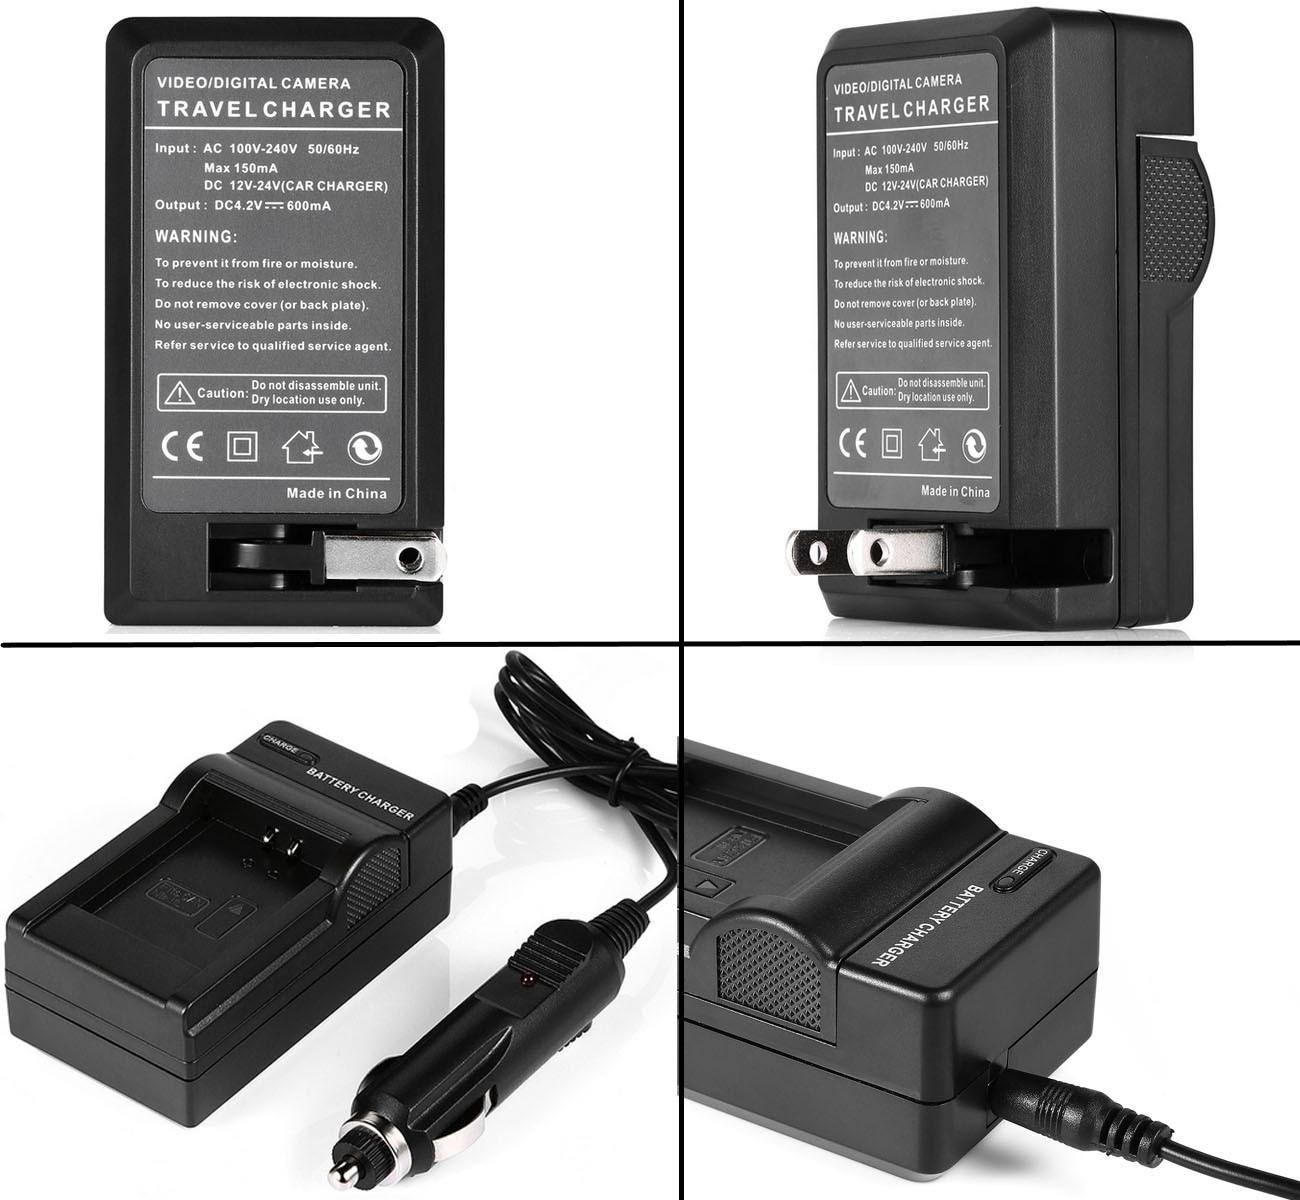 Cargador//Adaptador para Sony DSC-H400 DSC-HX300 DSC-HX350 DSC-HX400 DSC-HX400V